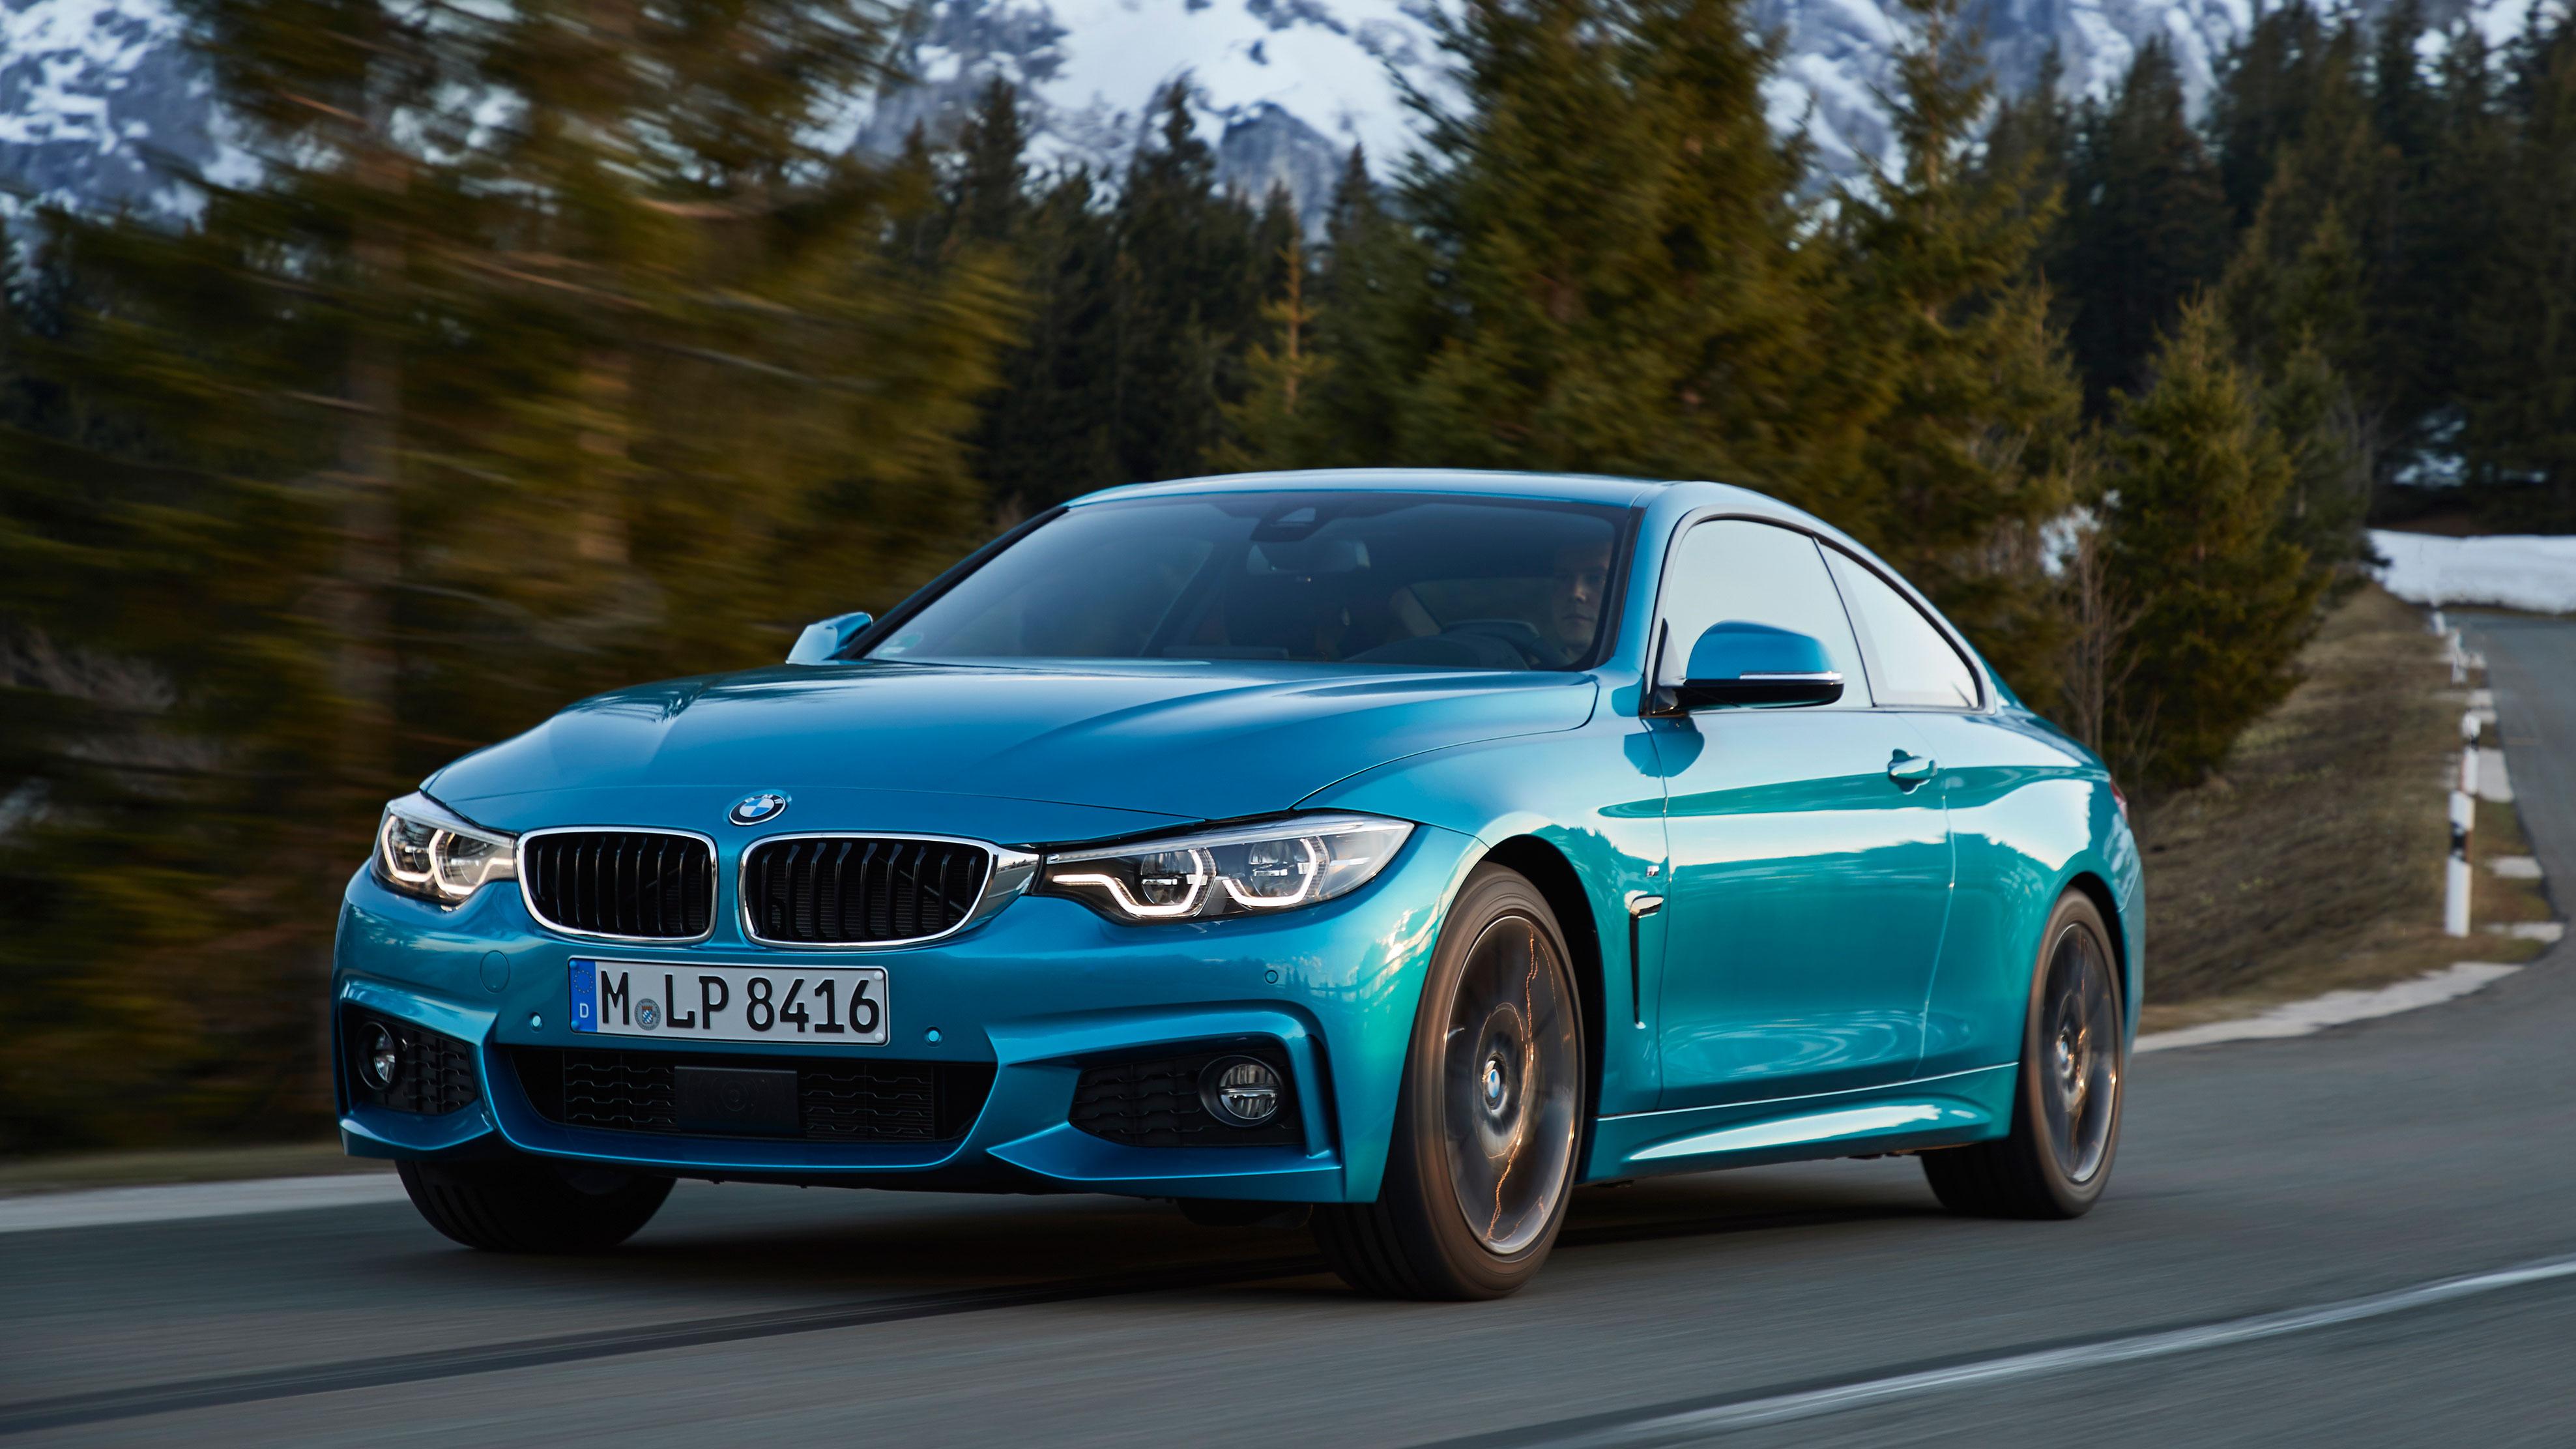 BMW 4 Series M Sport Coupe front quarter